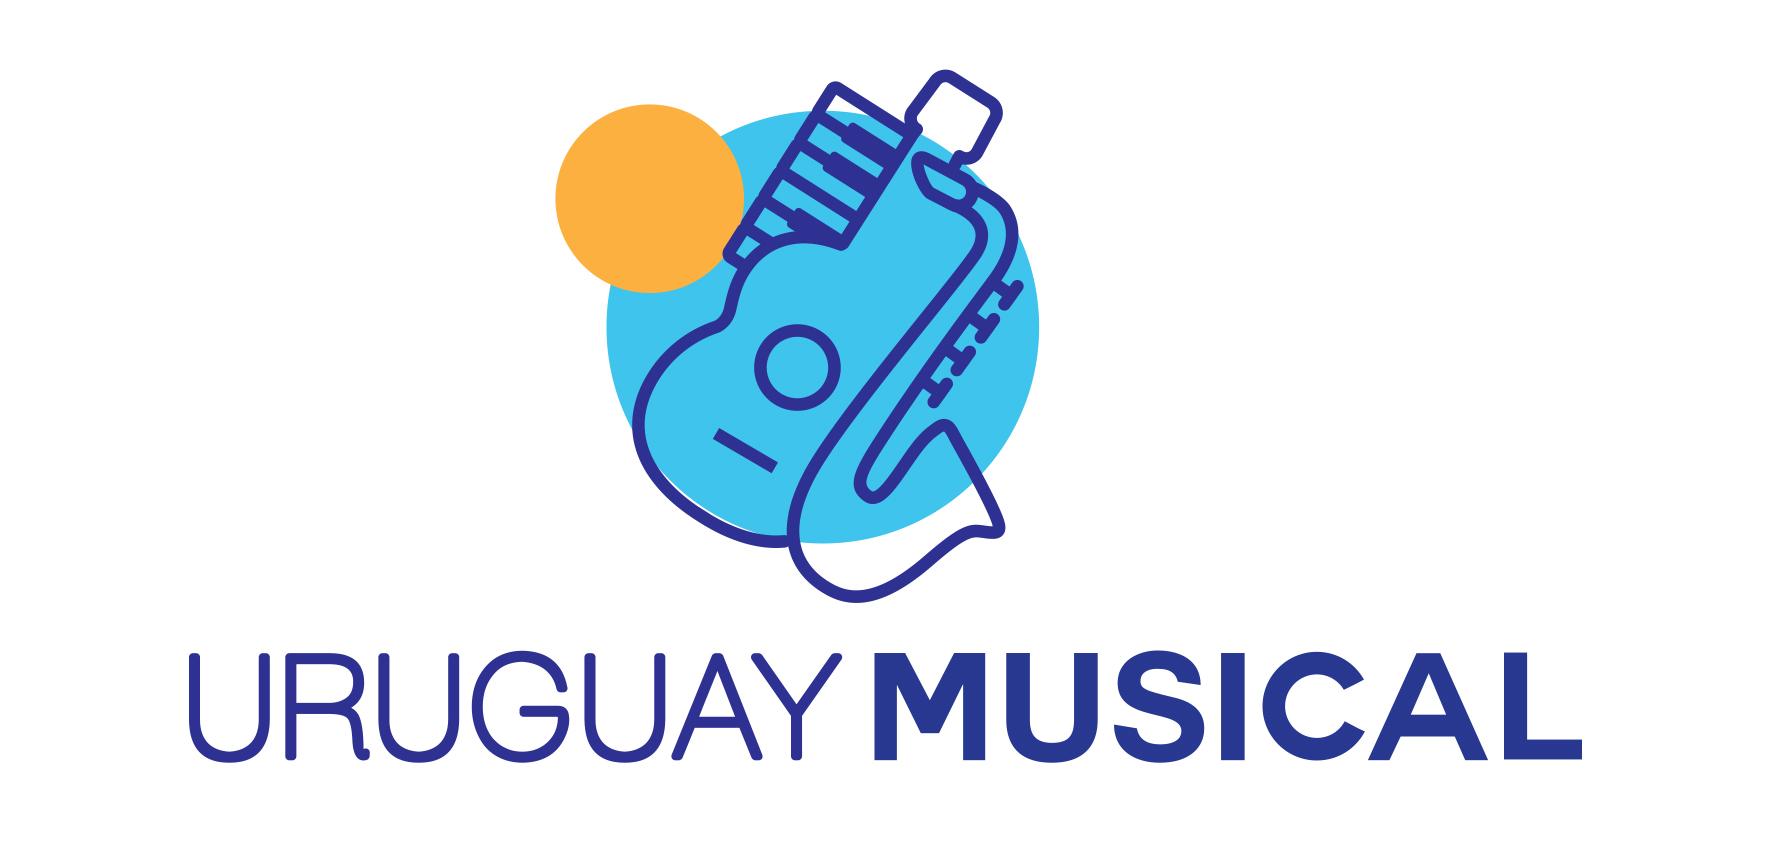 Uruguay musical